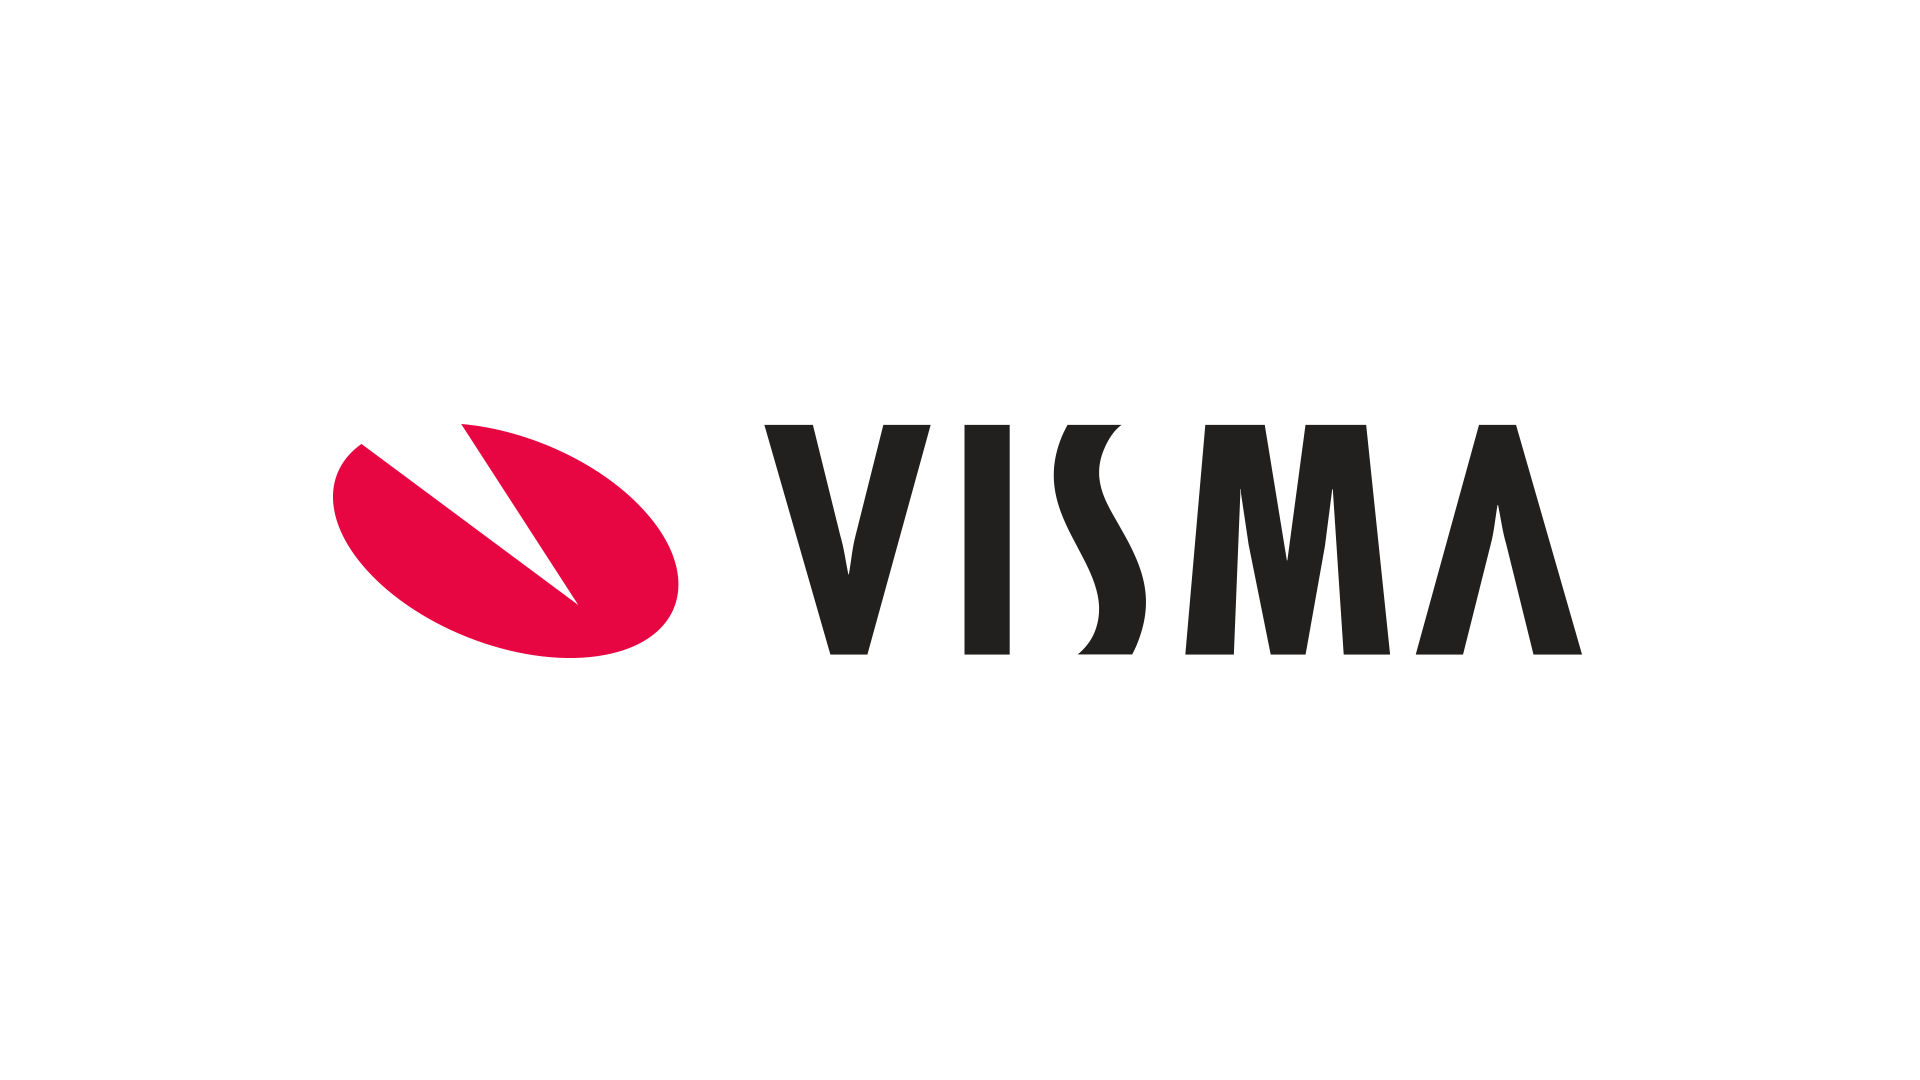 https://www.visma.fi